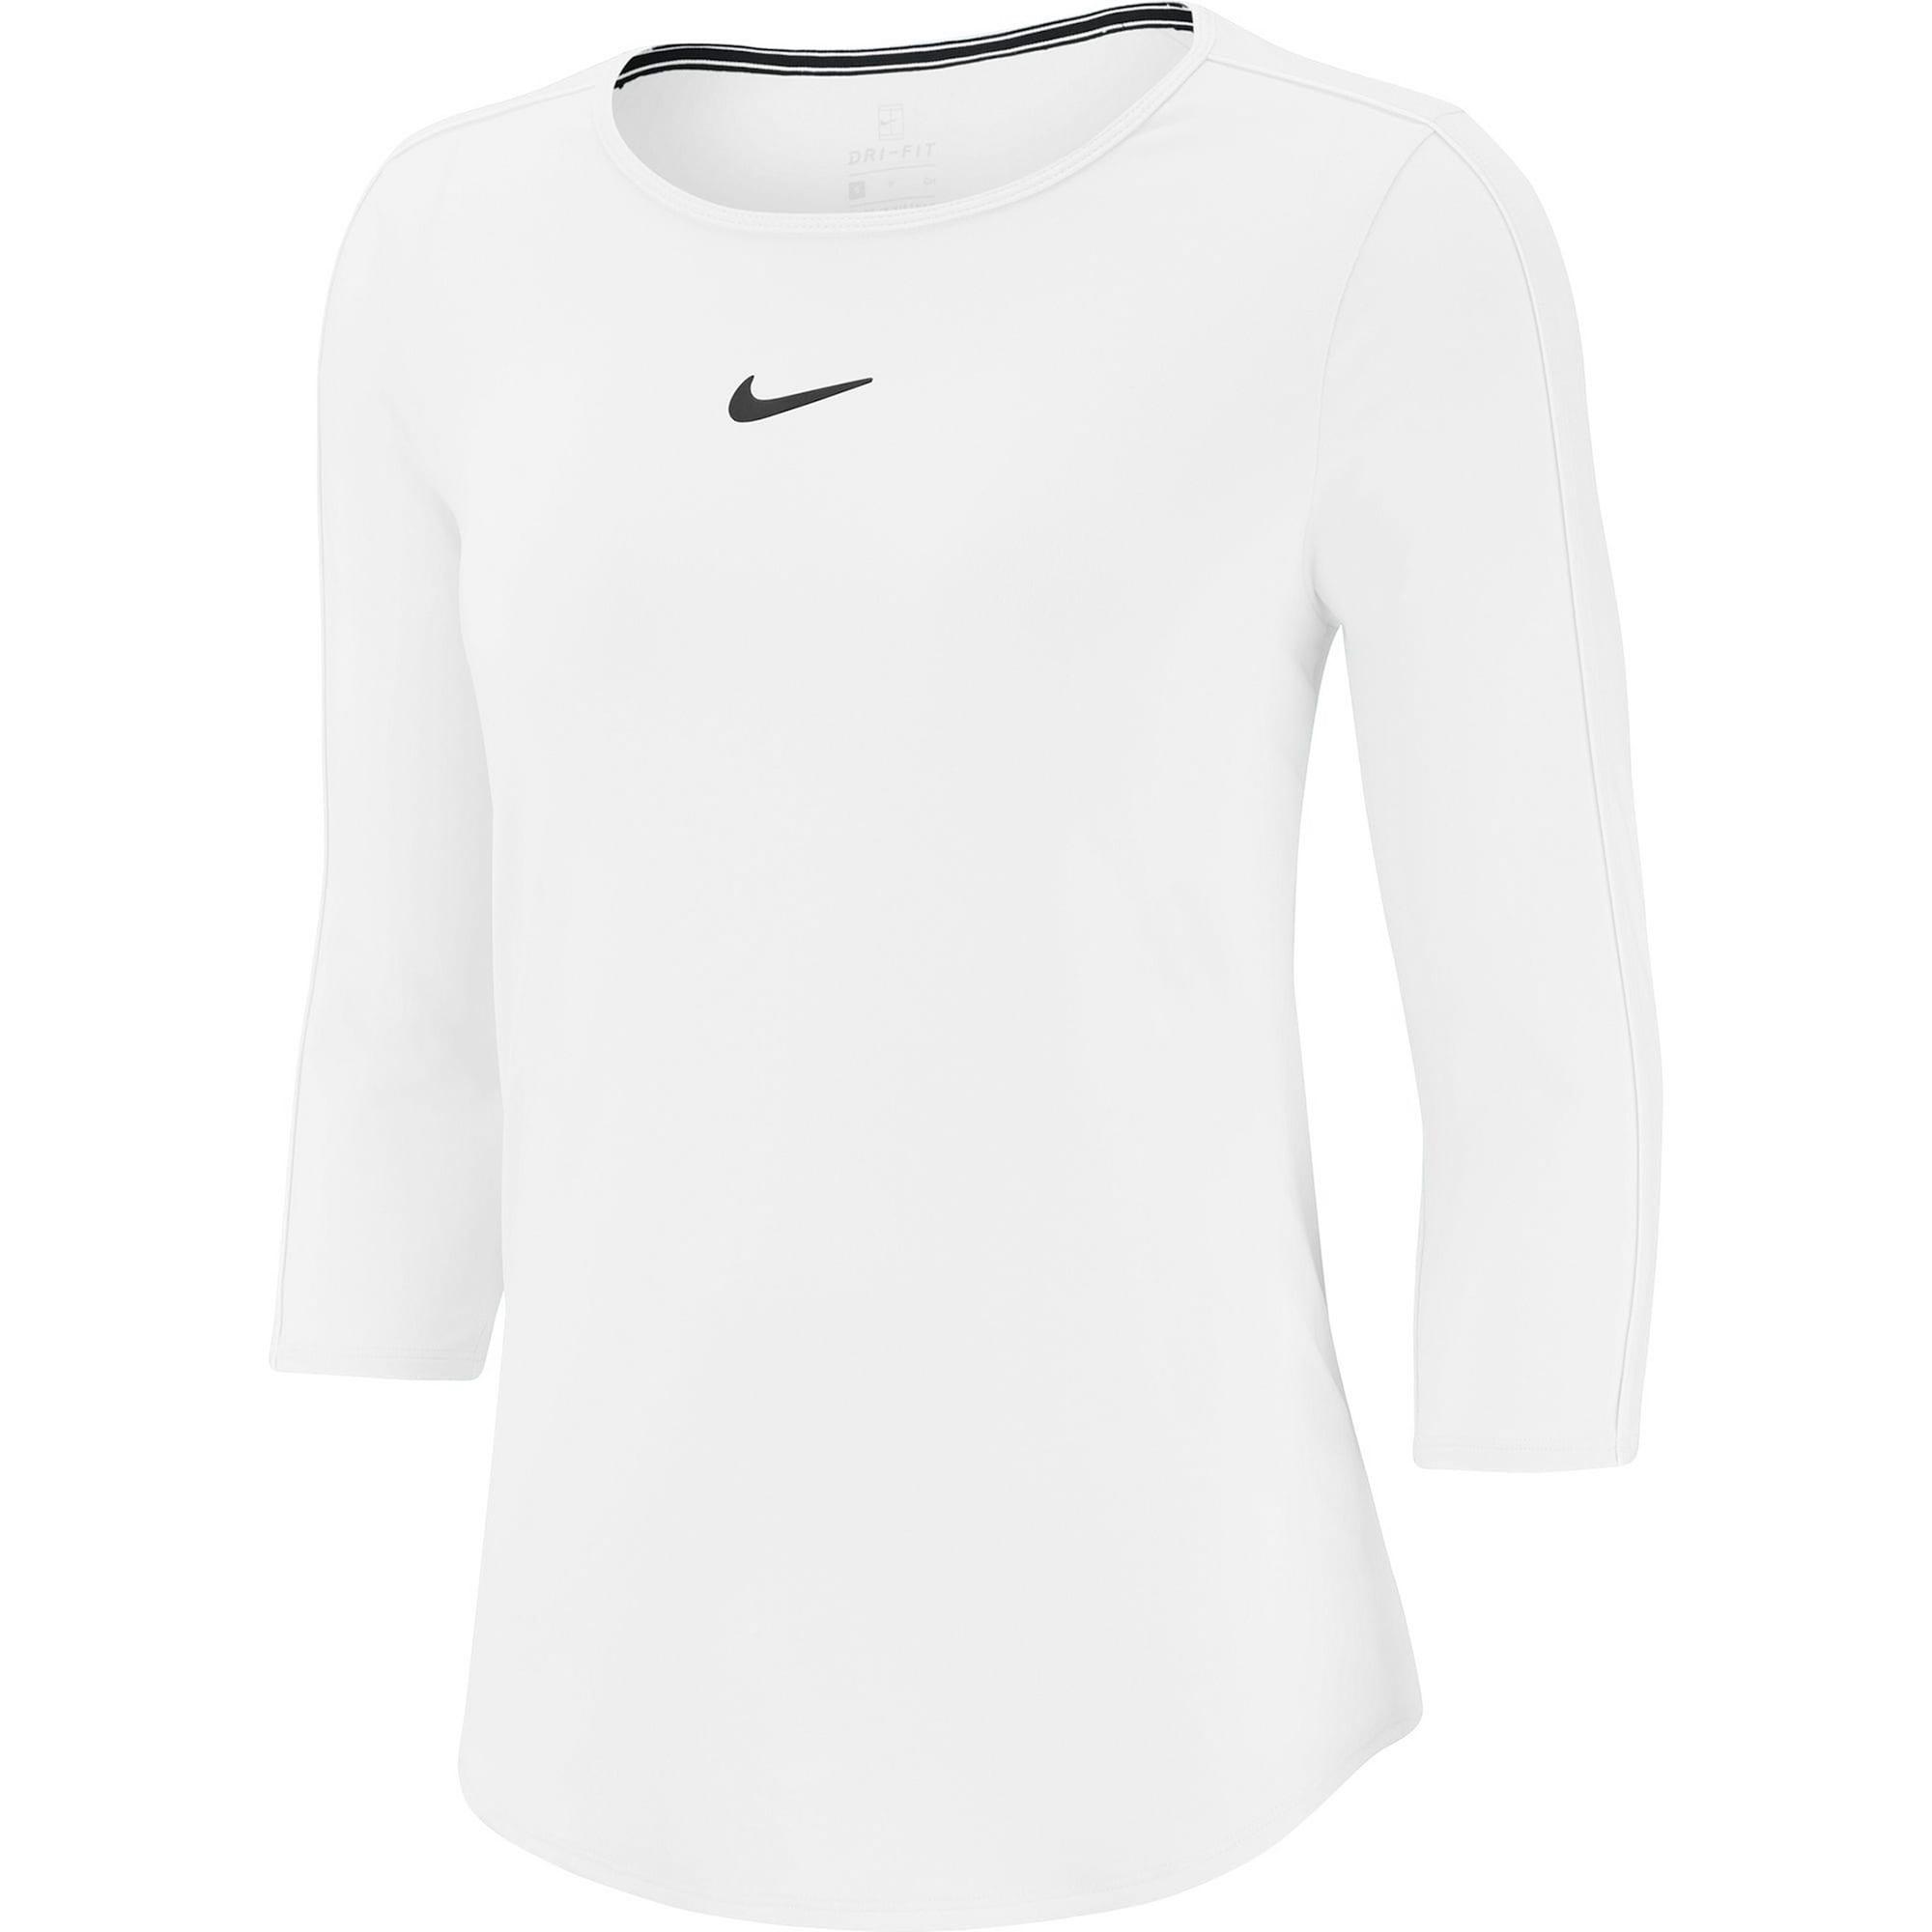 Tennisshirt 'W NKCT TOP 3QT' | Sportbekleidung > Sportshirts > Tennisshirts | Nike